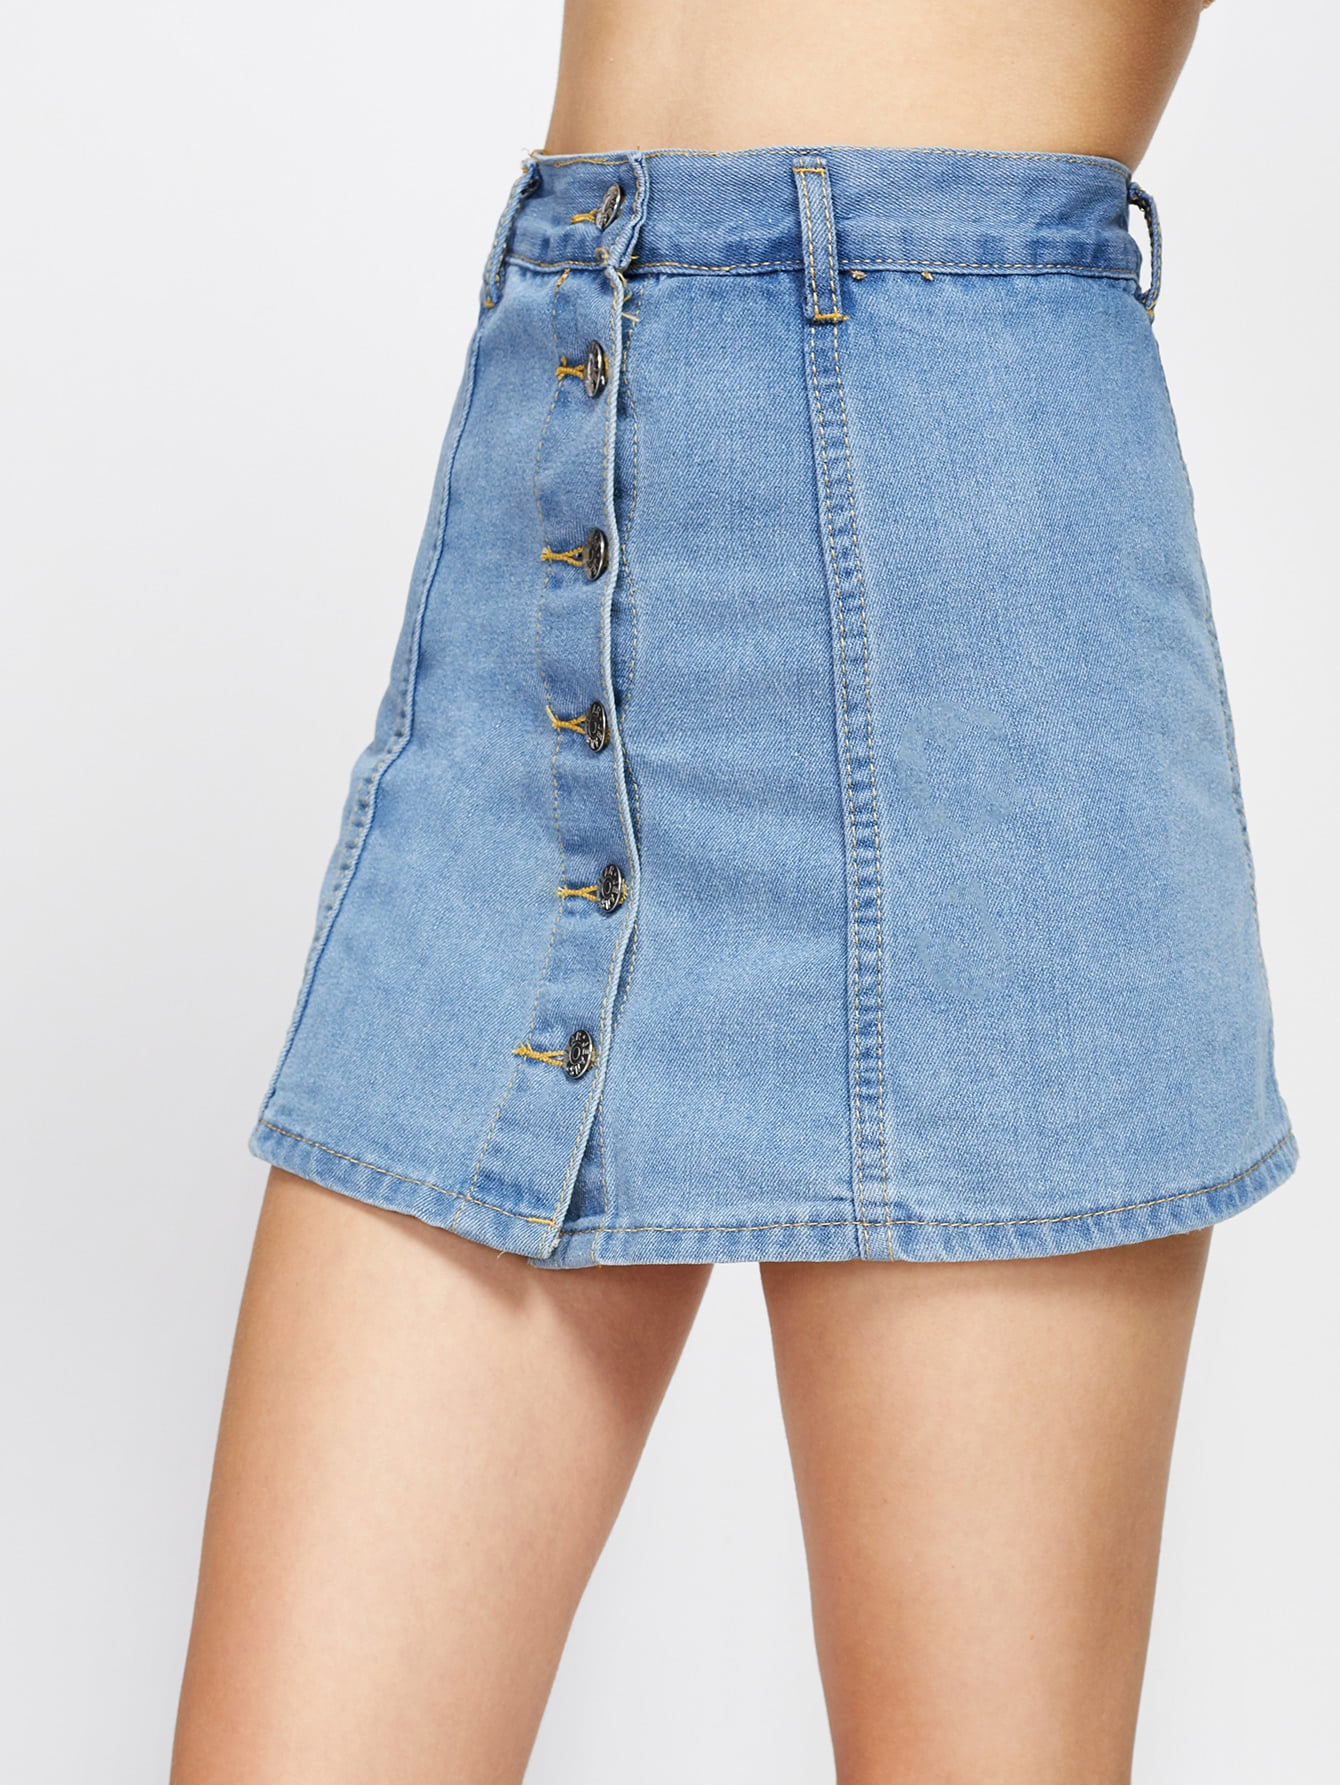 Single Breasted Denim Skirt Shorts